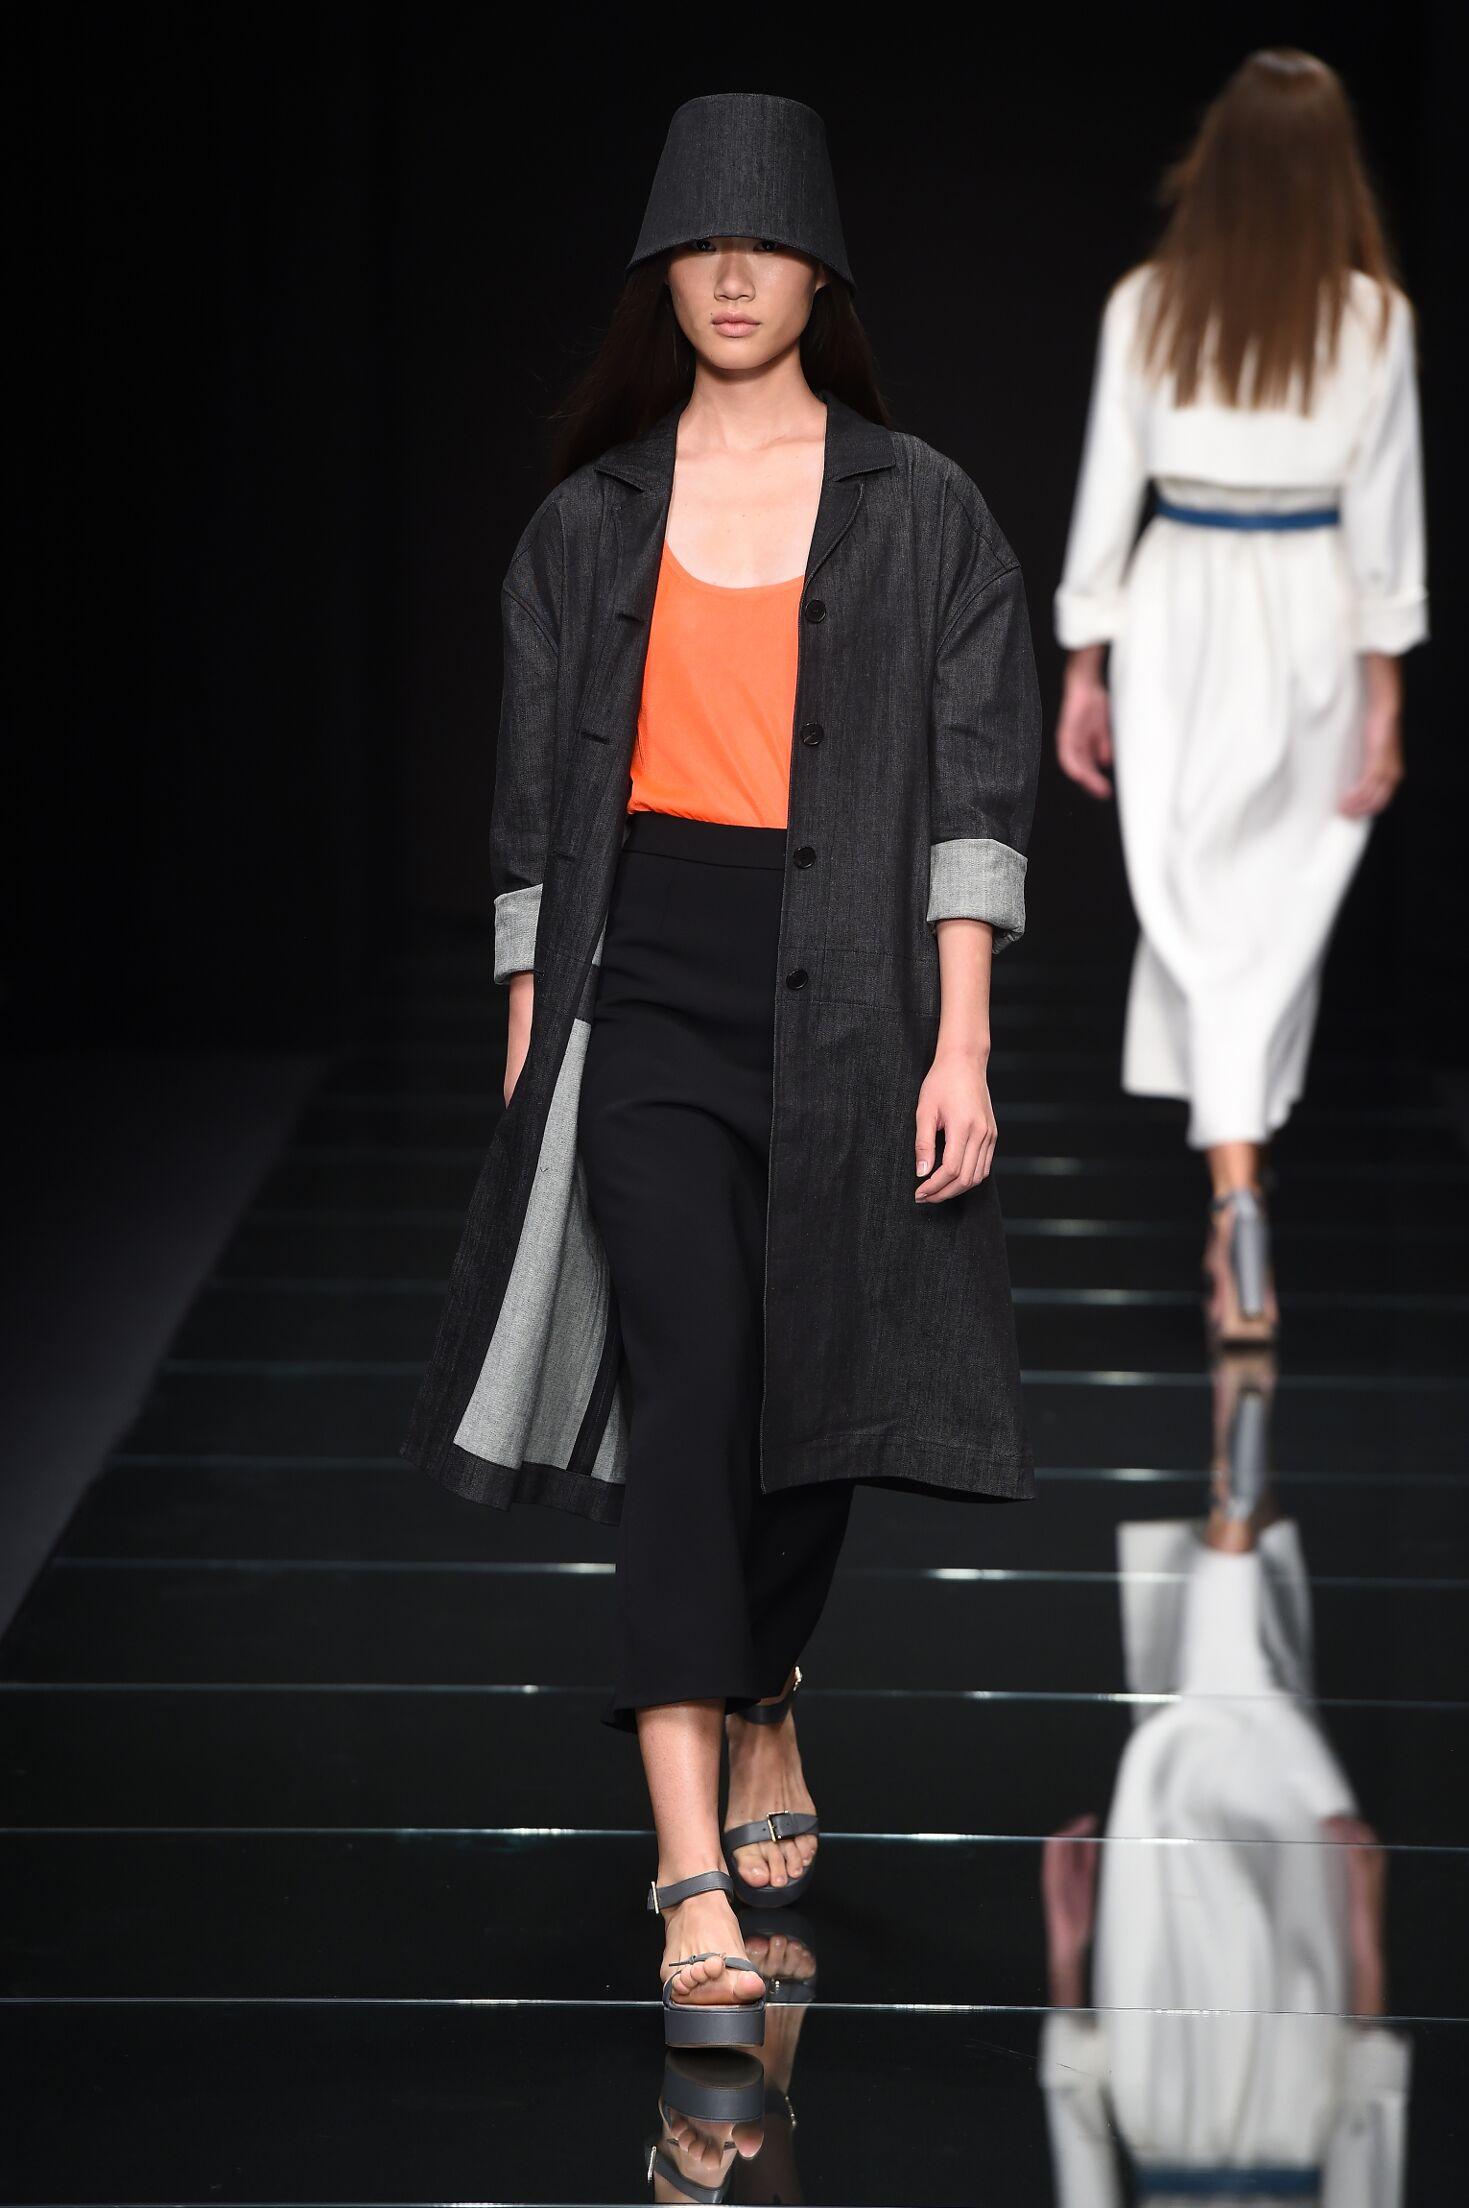 Anteprima Fashion Show